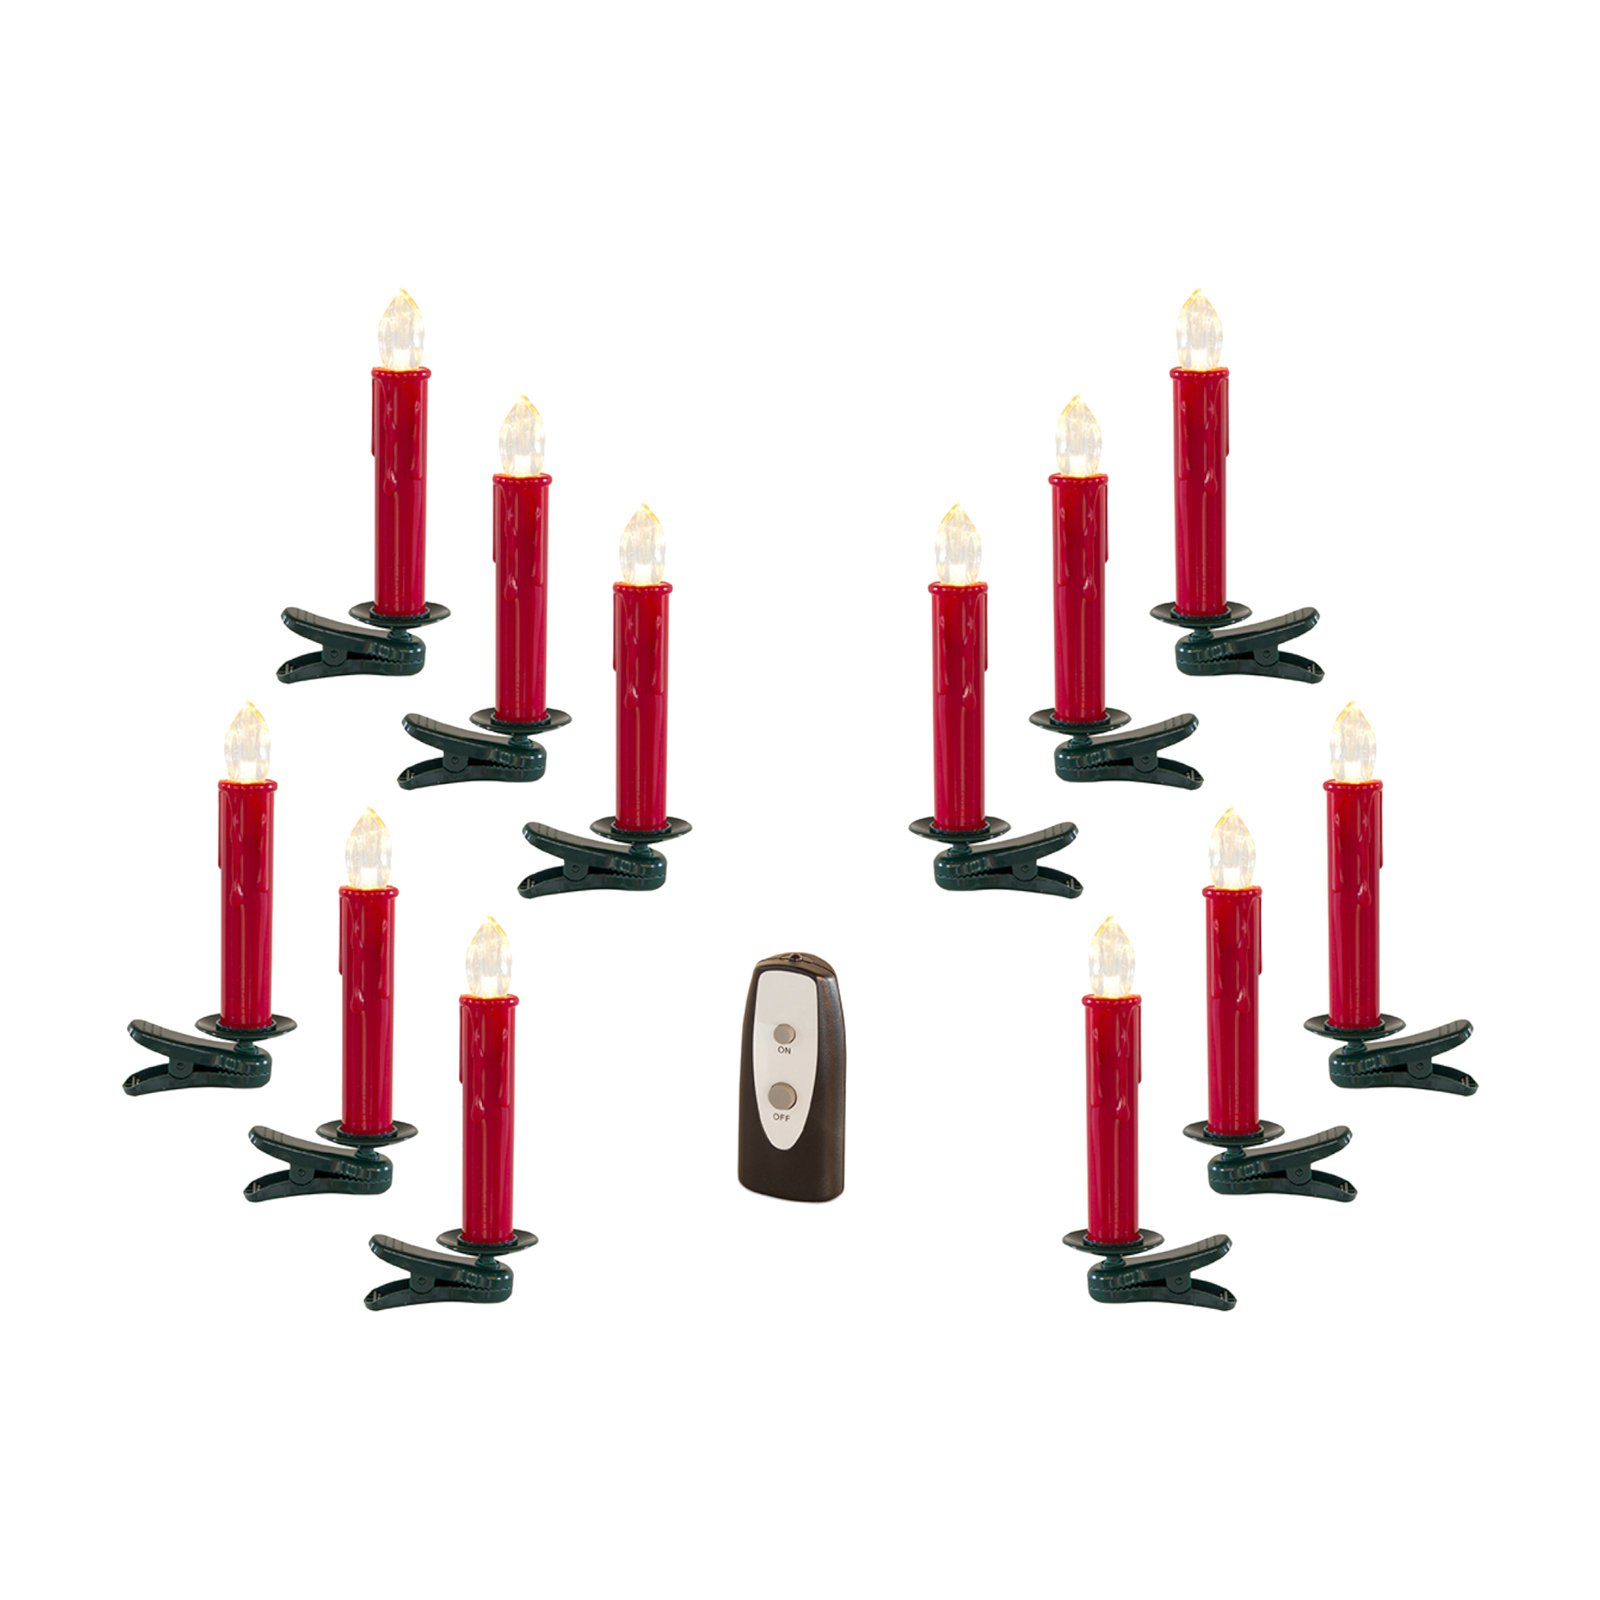 Melrose LED Clip On Taper Candle - Set of 24